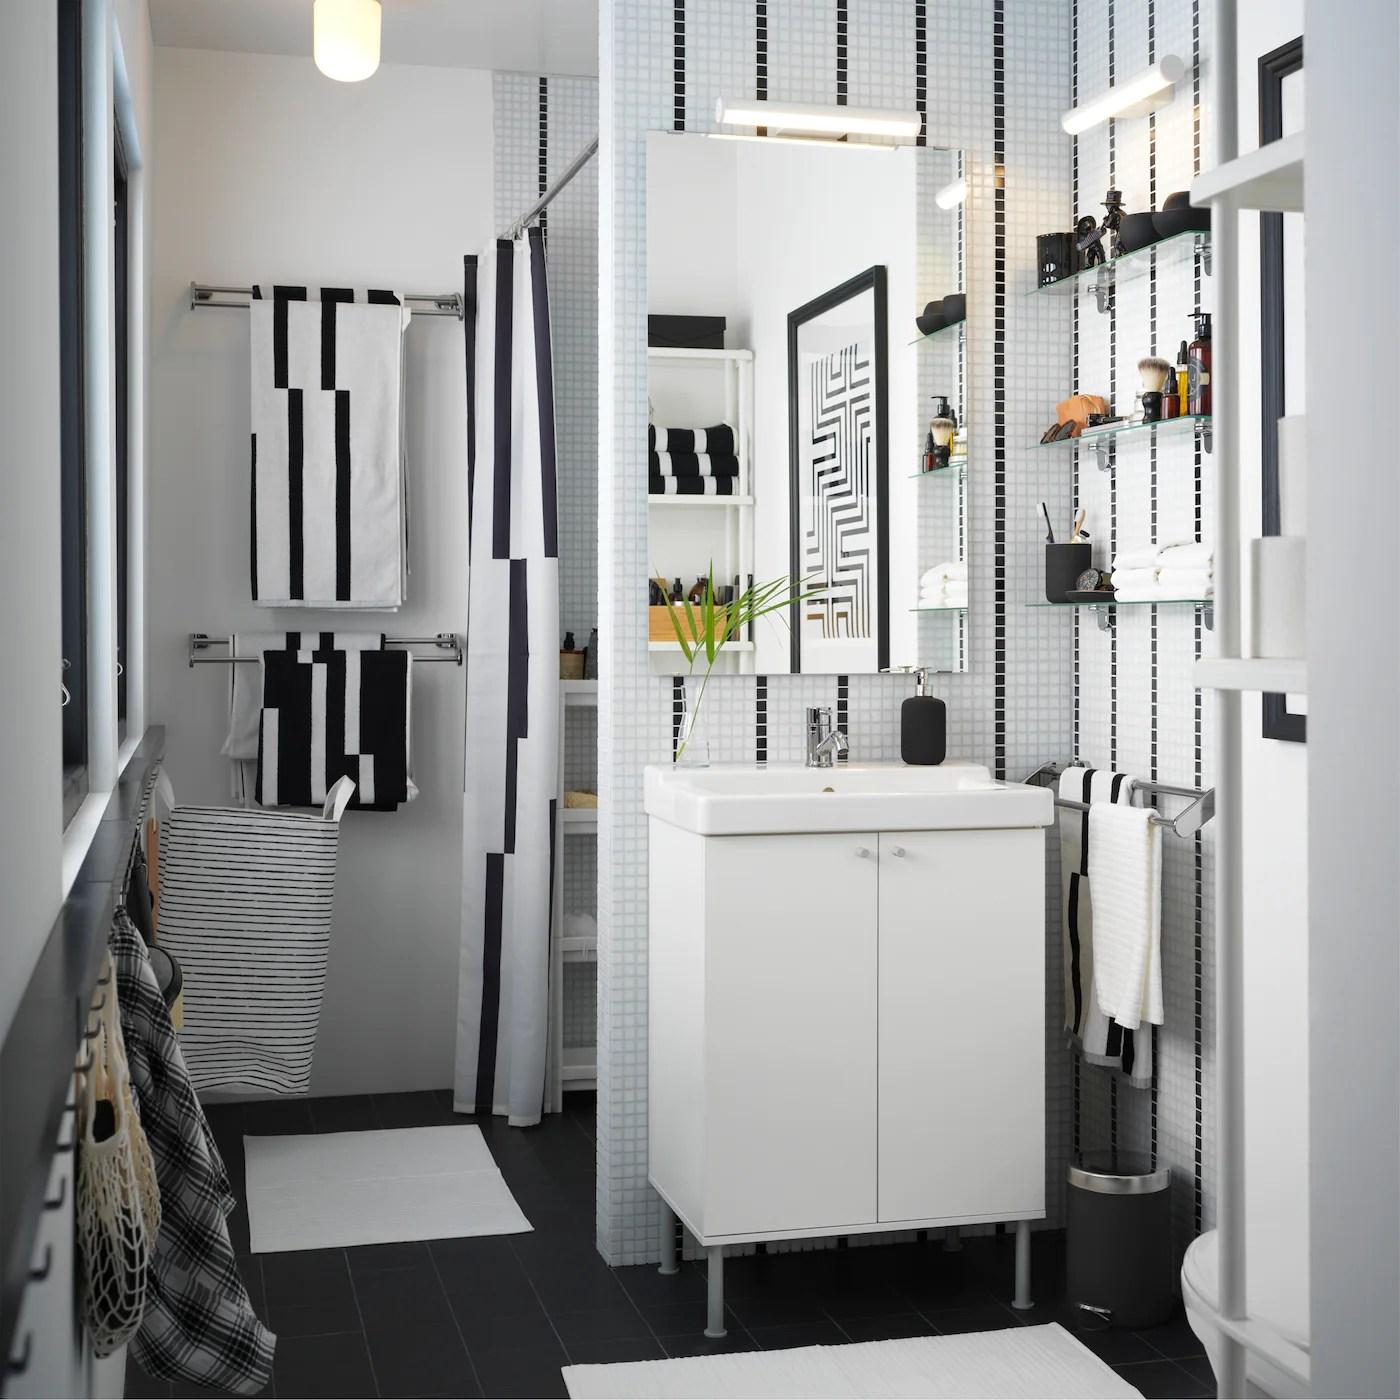 A Small Beautiful Bathroom With Functional Storage Ikea Switzerland